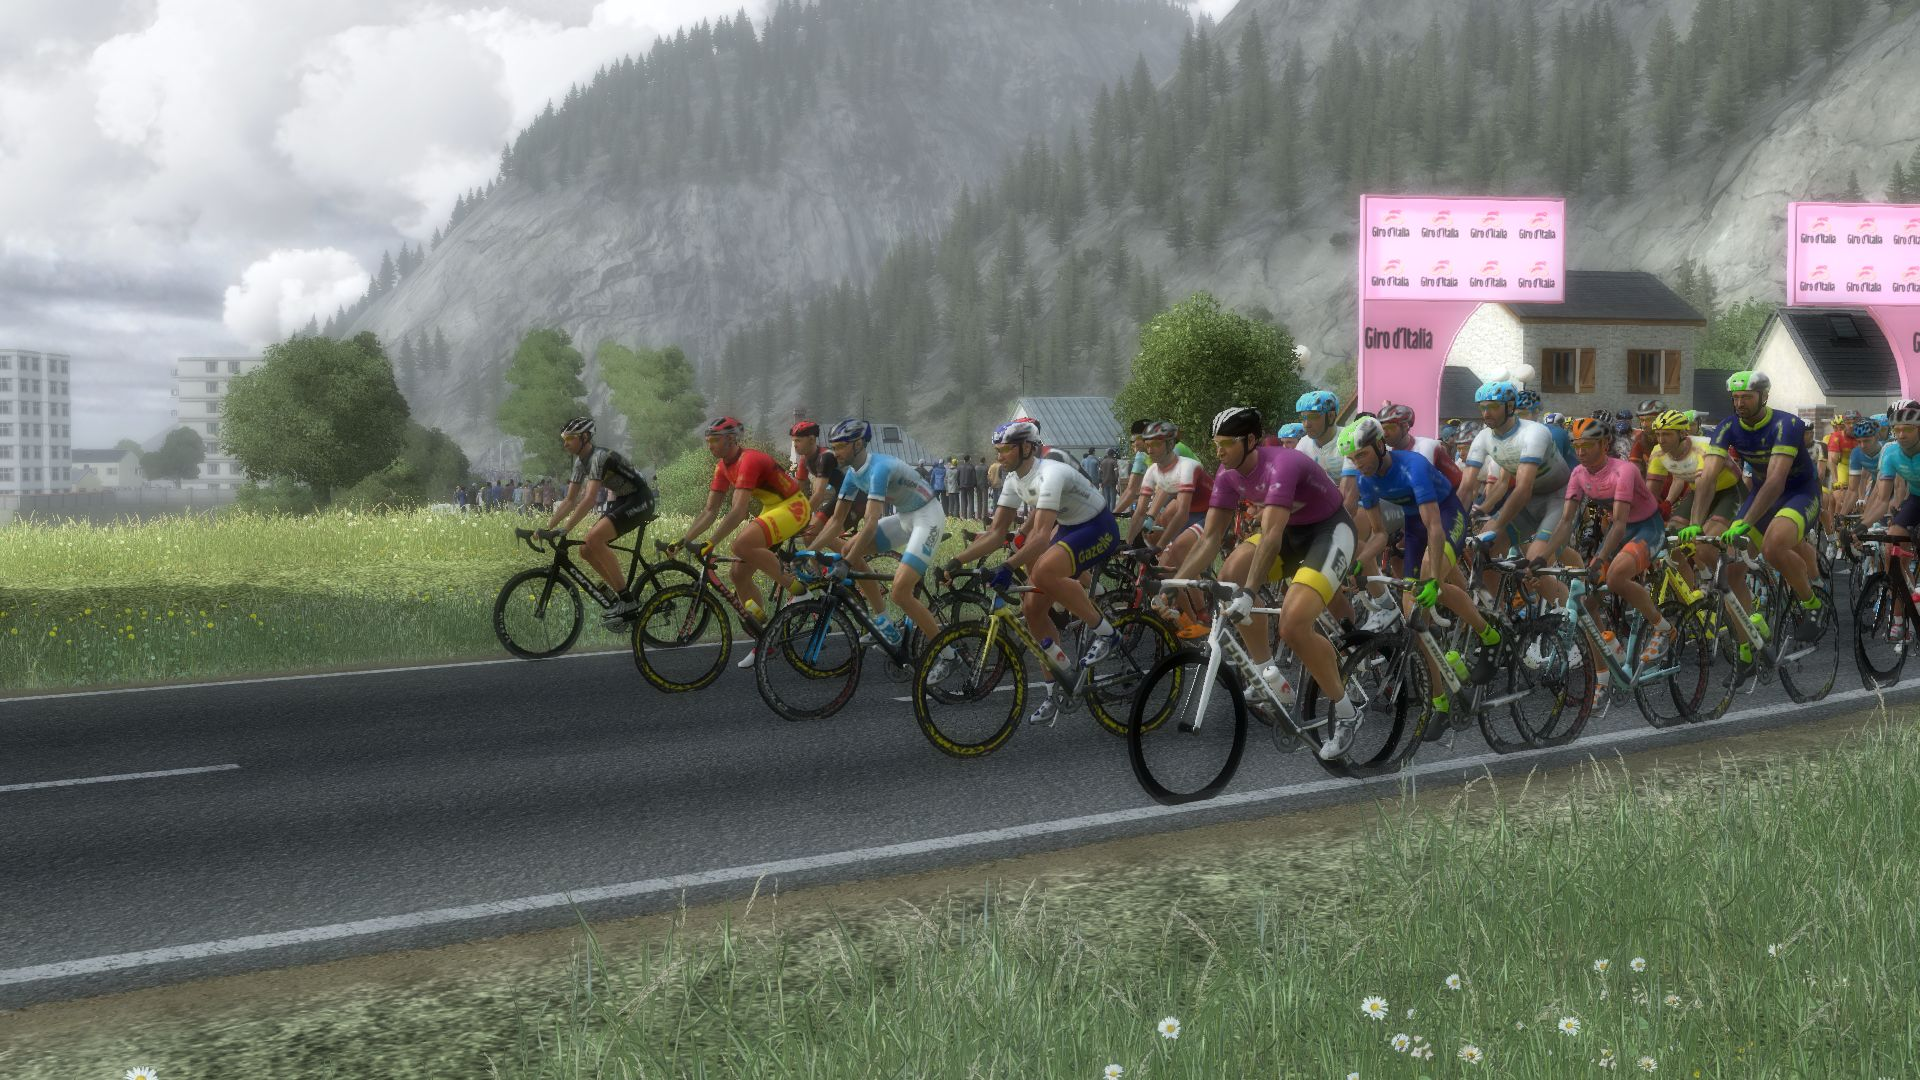 pcmdaily.com/images/mg/2020/Reports/GTM/Giro/S20/mg20_giro_s20_001.jpg